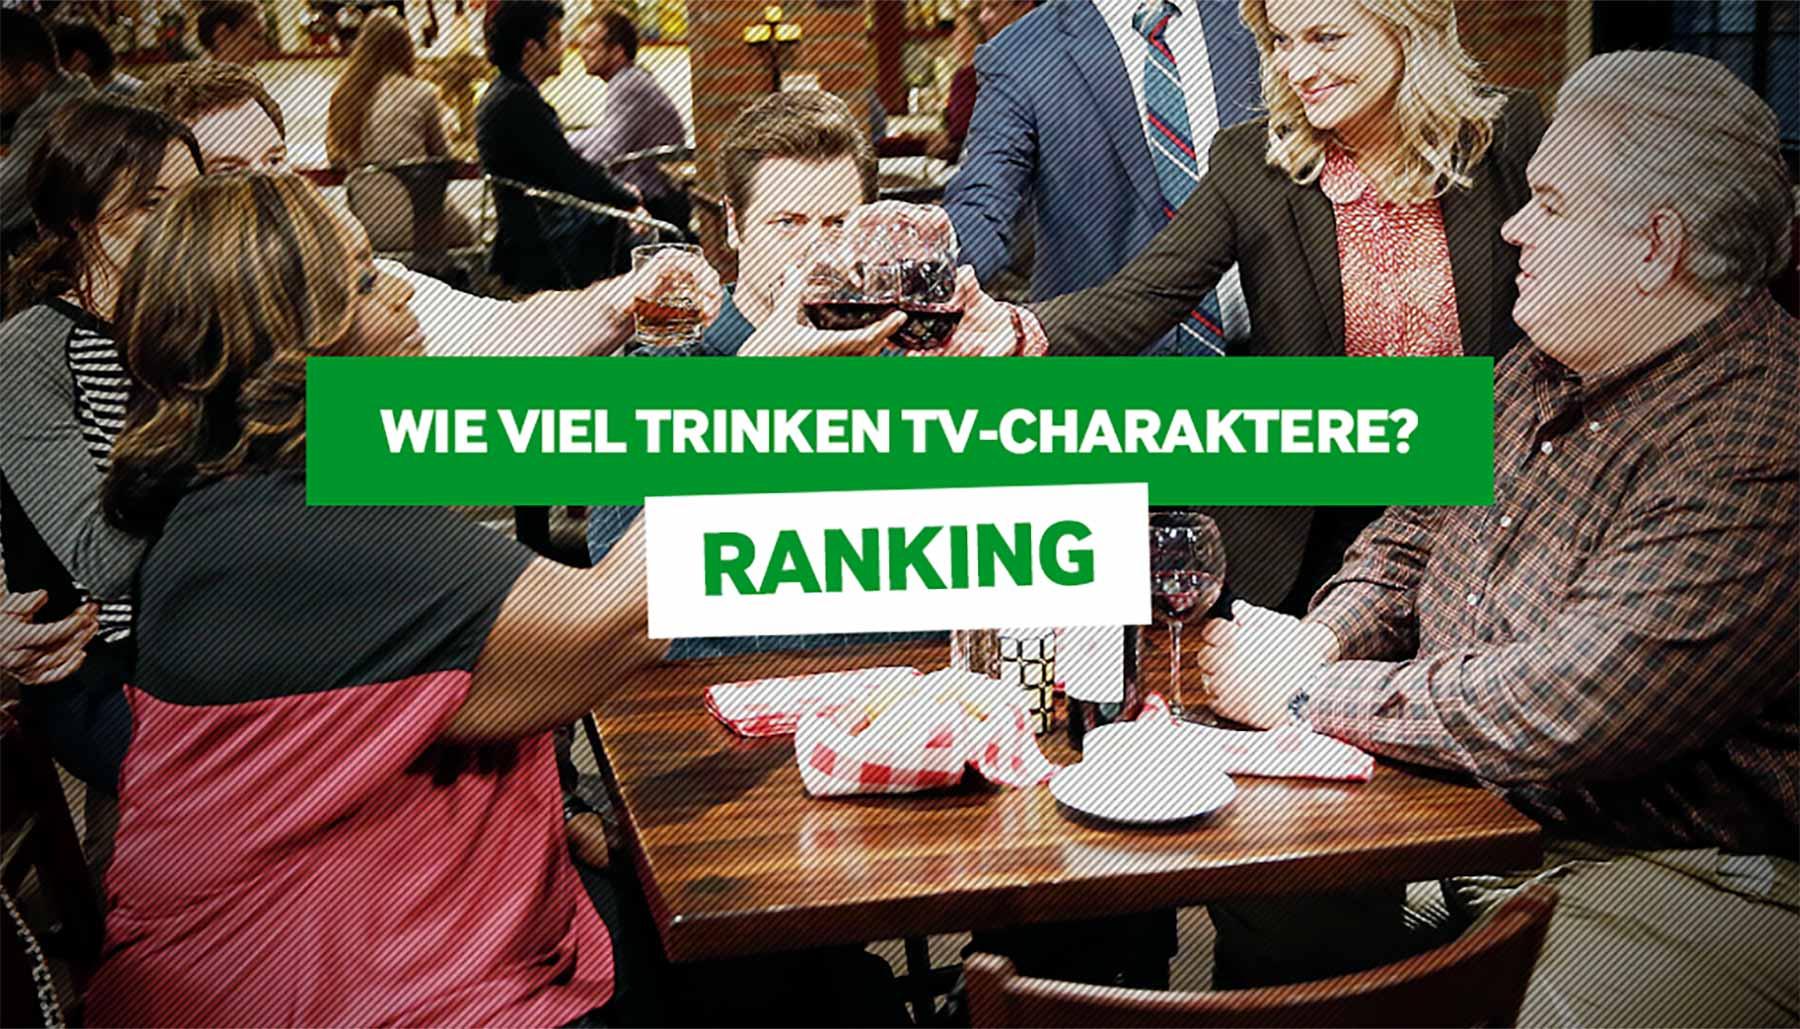 Welche Seriencharaktere trinken besonders viel? wieviel-trinken-tv-charaktere